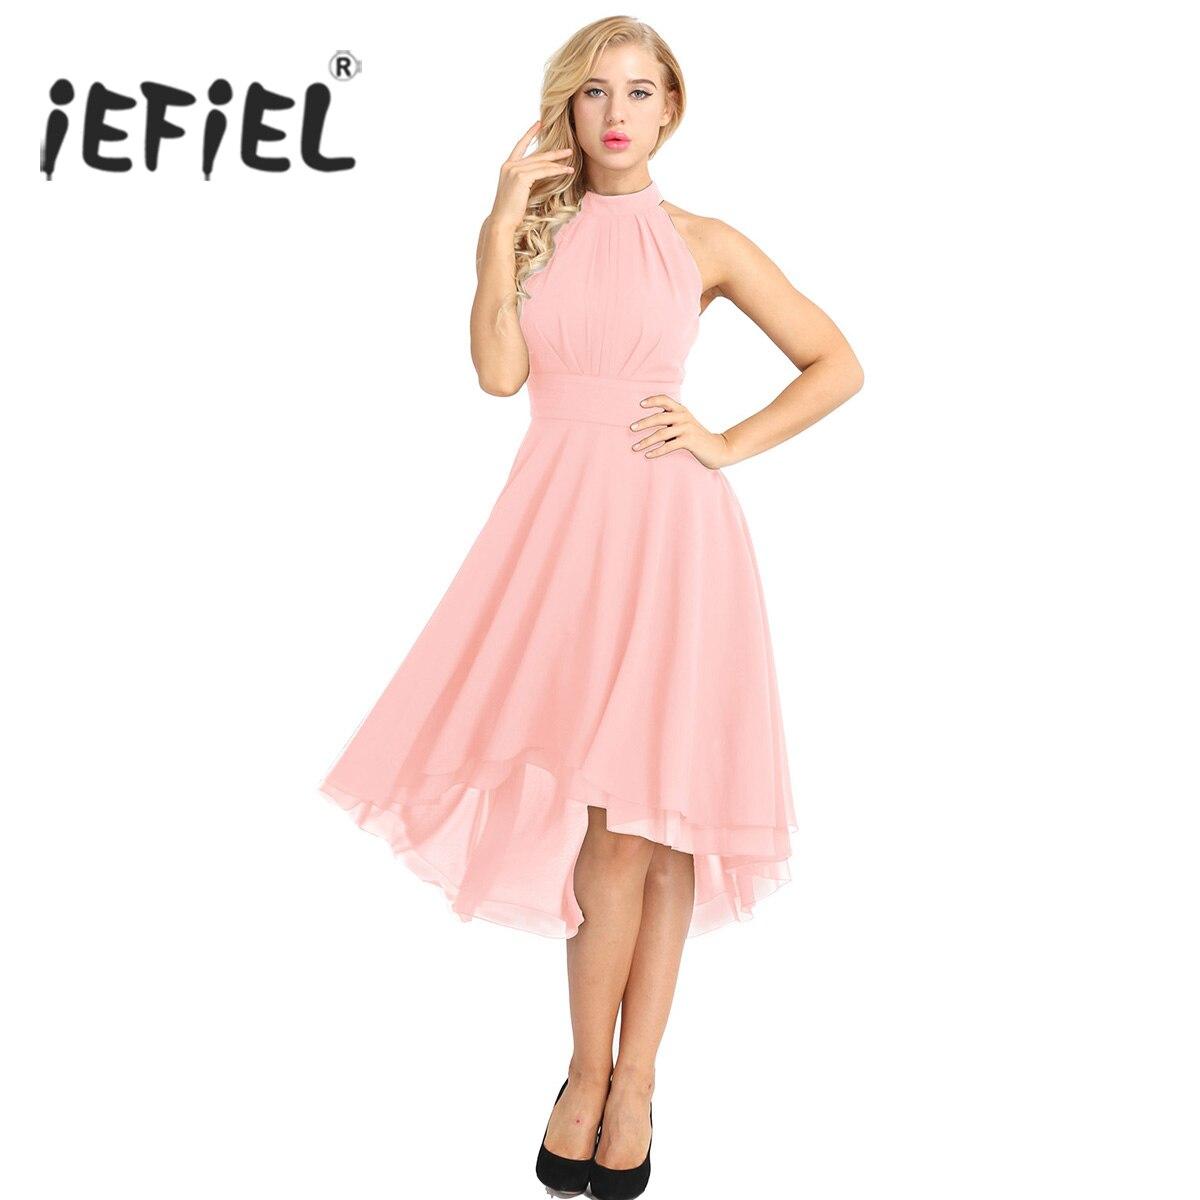 iEFiEL Women Ladies Halter Neck Sleeveless High-low Chiffon Elegant Dresses Vestido de festa Evening Party Prom Gown Dresses